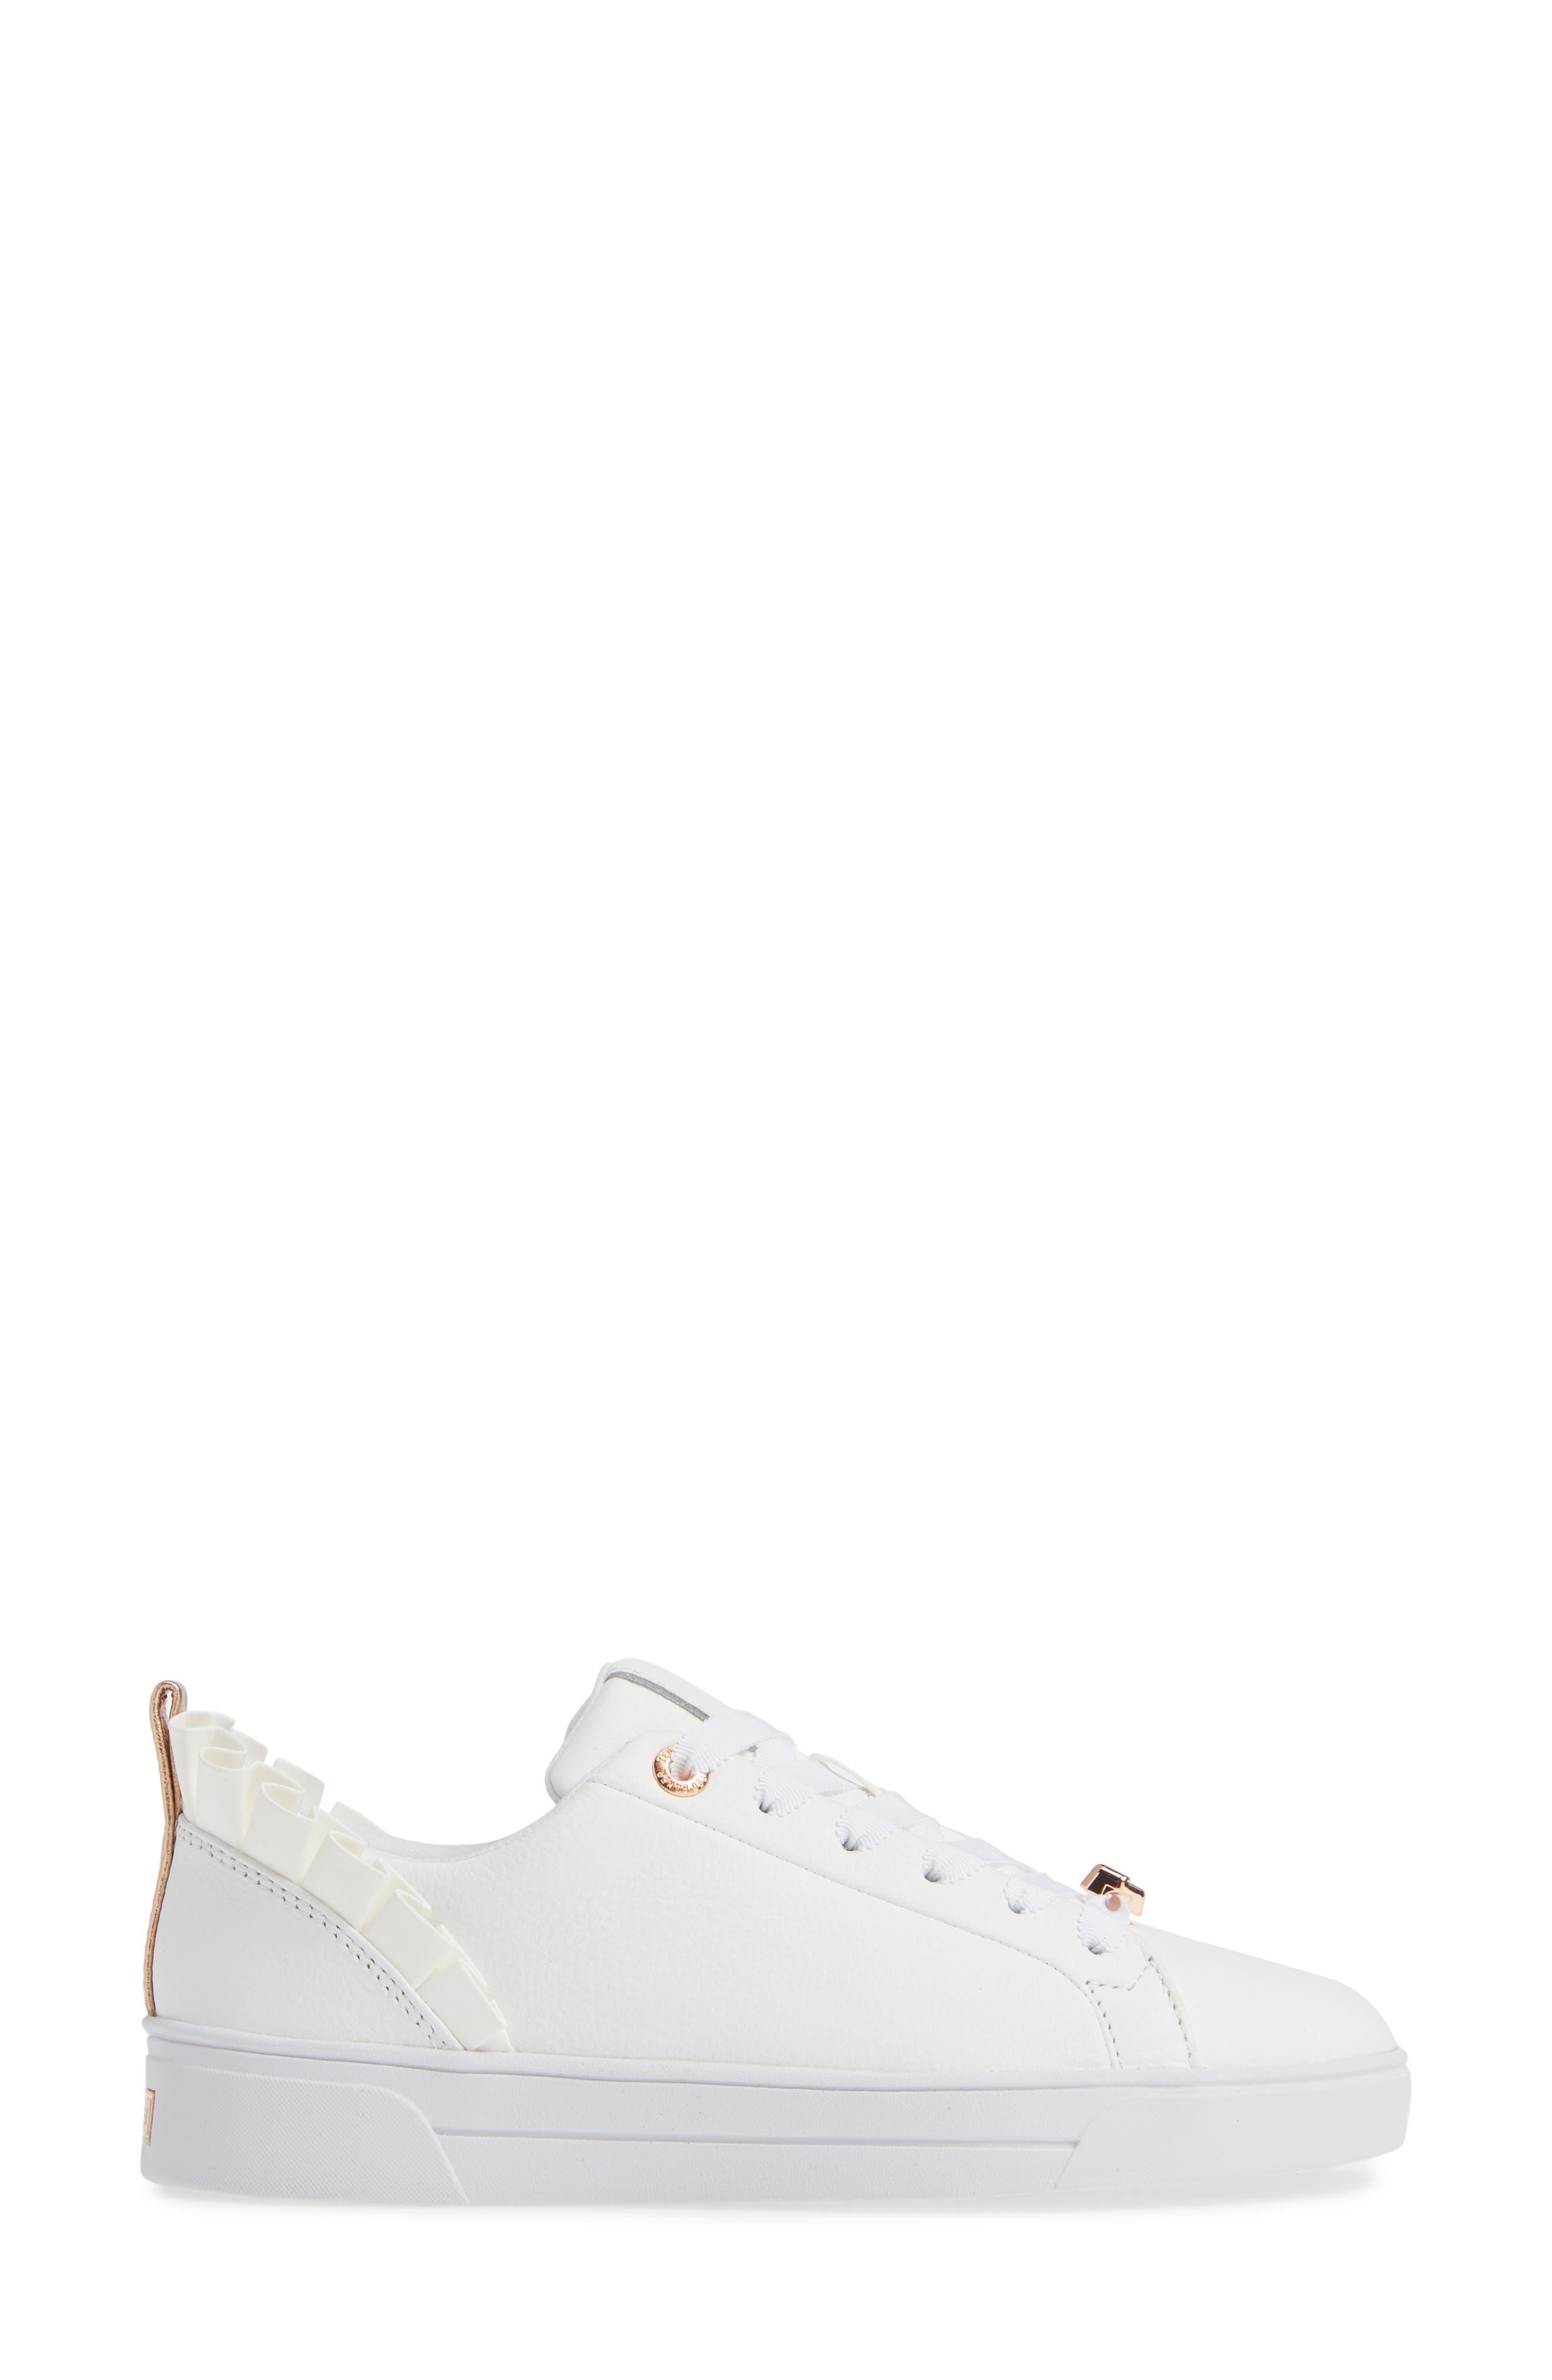 Astrina Sneaker,                             Alternate thumbnail 3, color,                             WHITE LEATHER